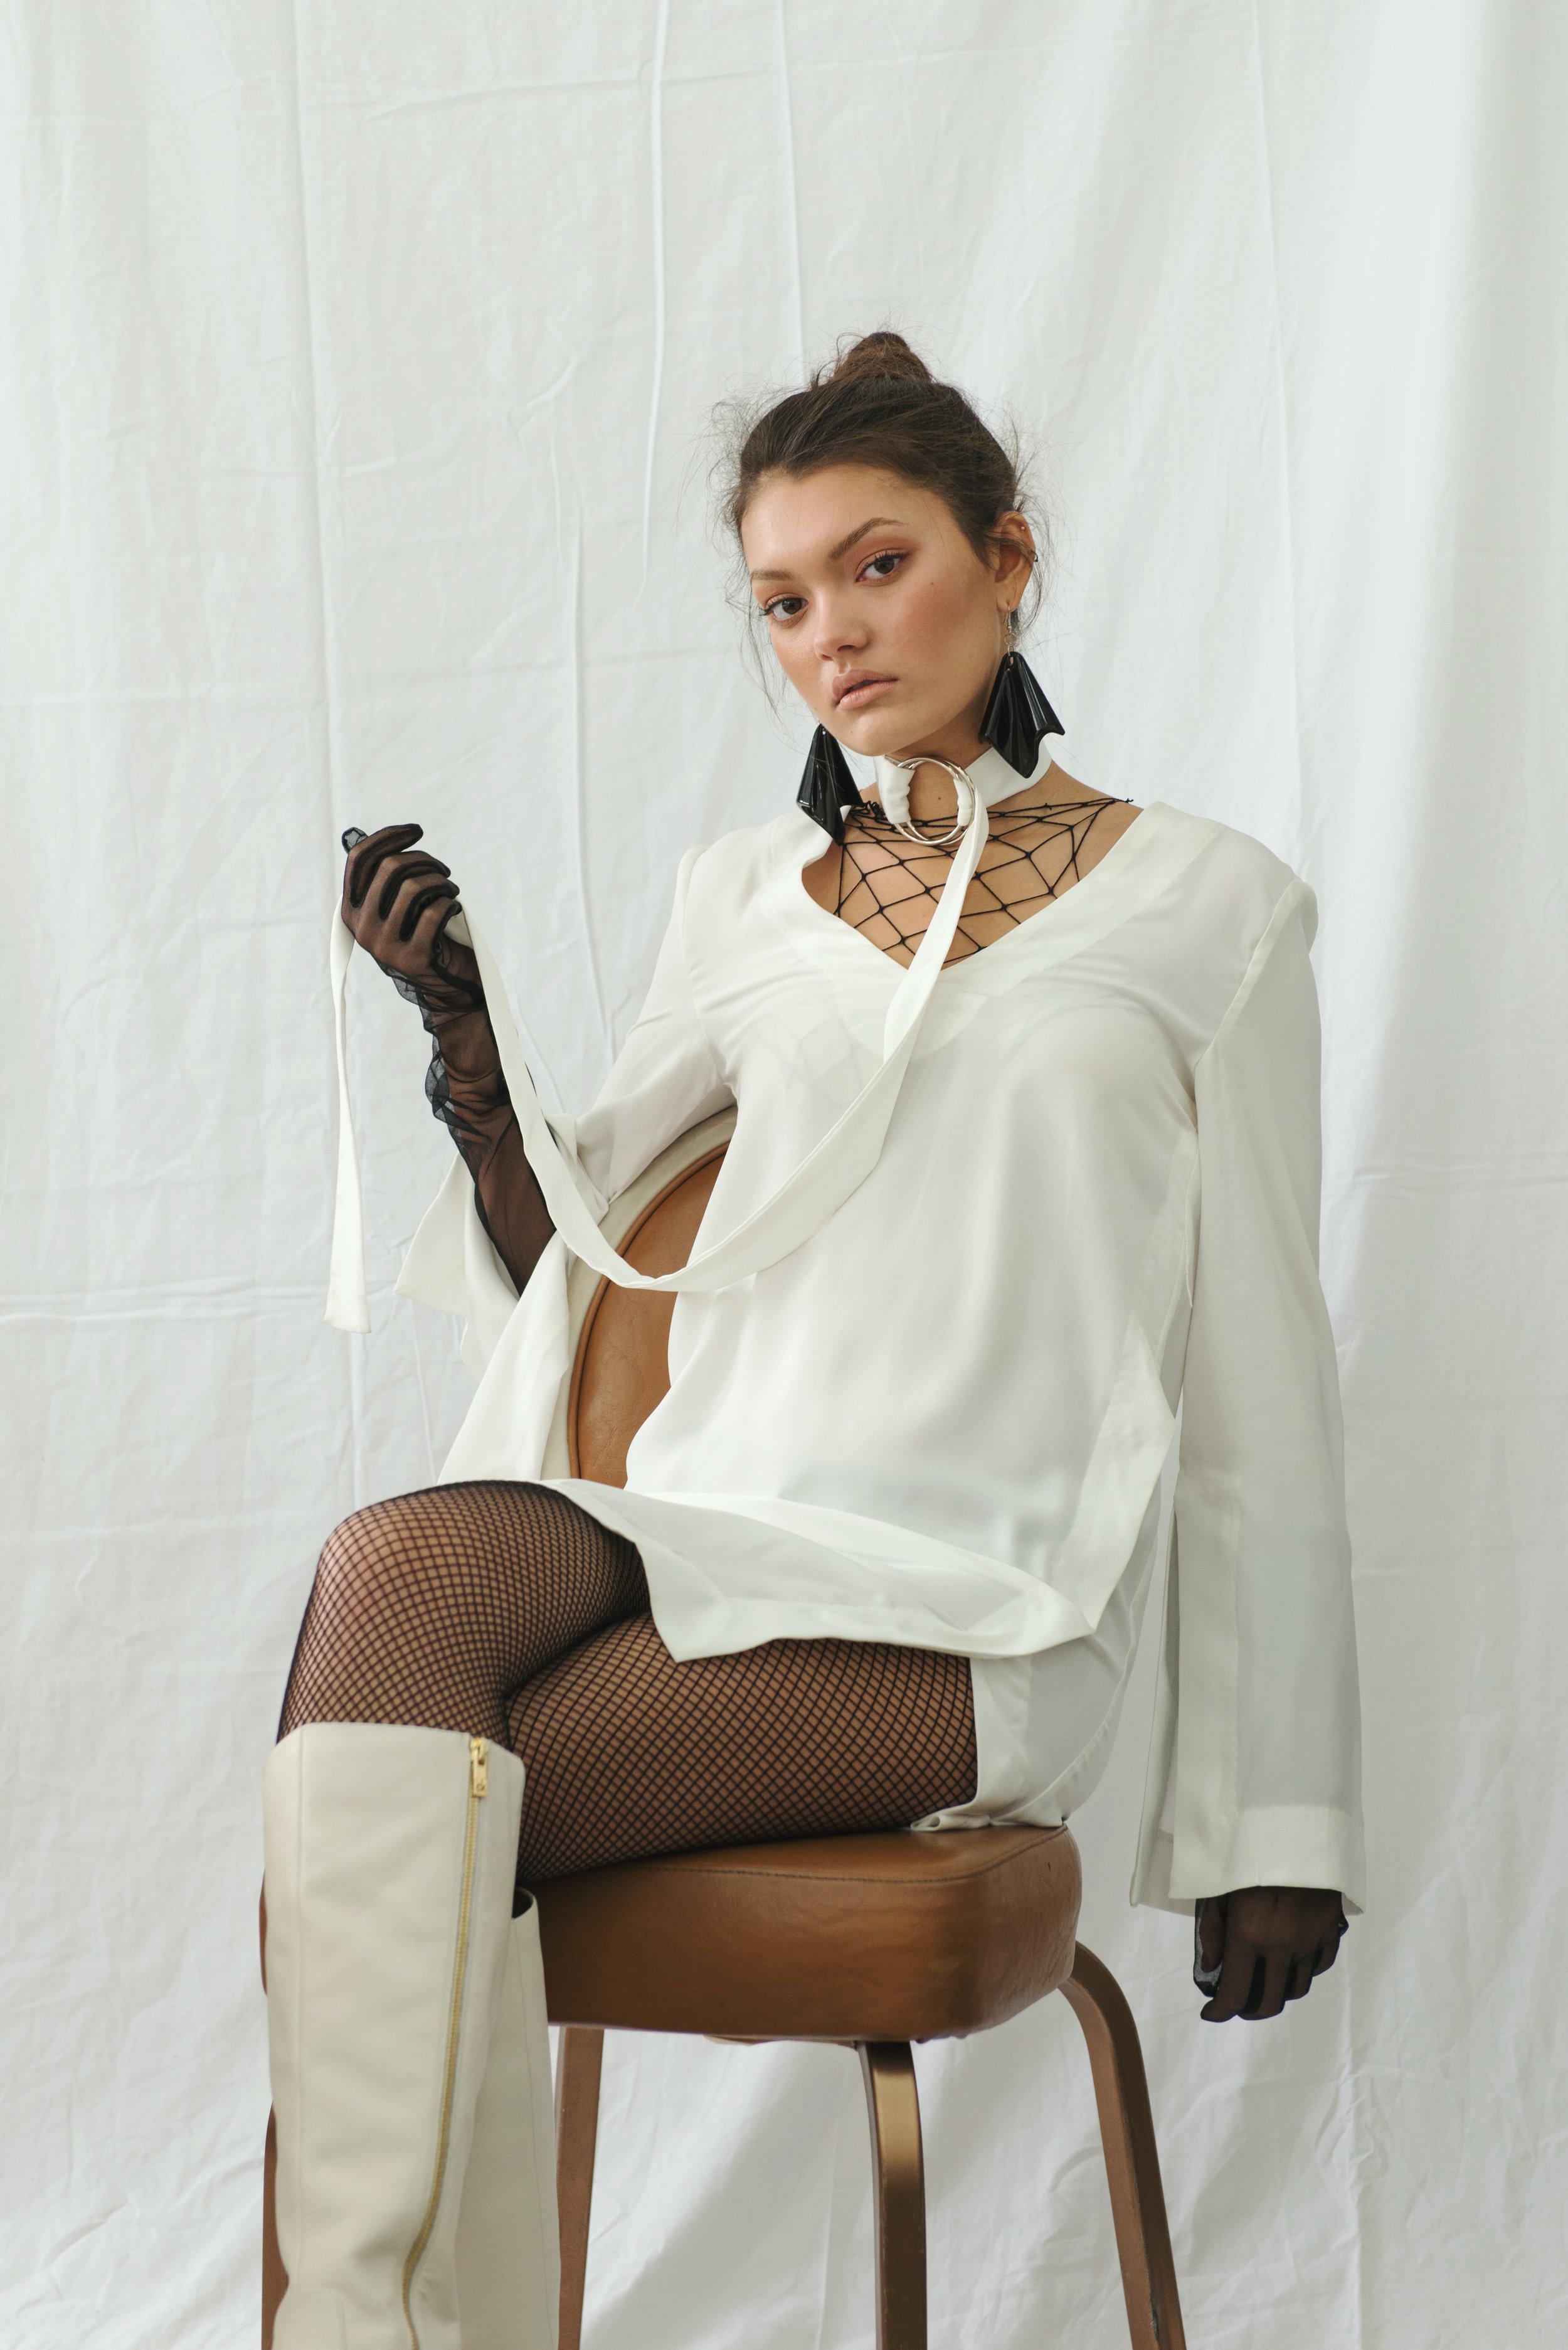 boots  CALVIN KLEIN , dress + gloves VINTAGE, earrings STYLIST'S ARCHIVE